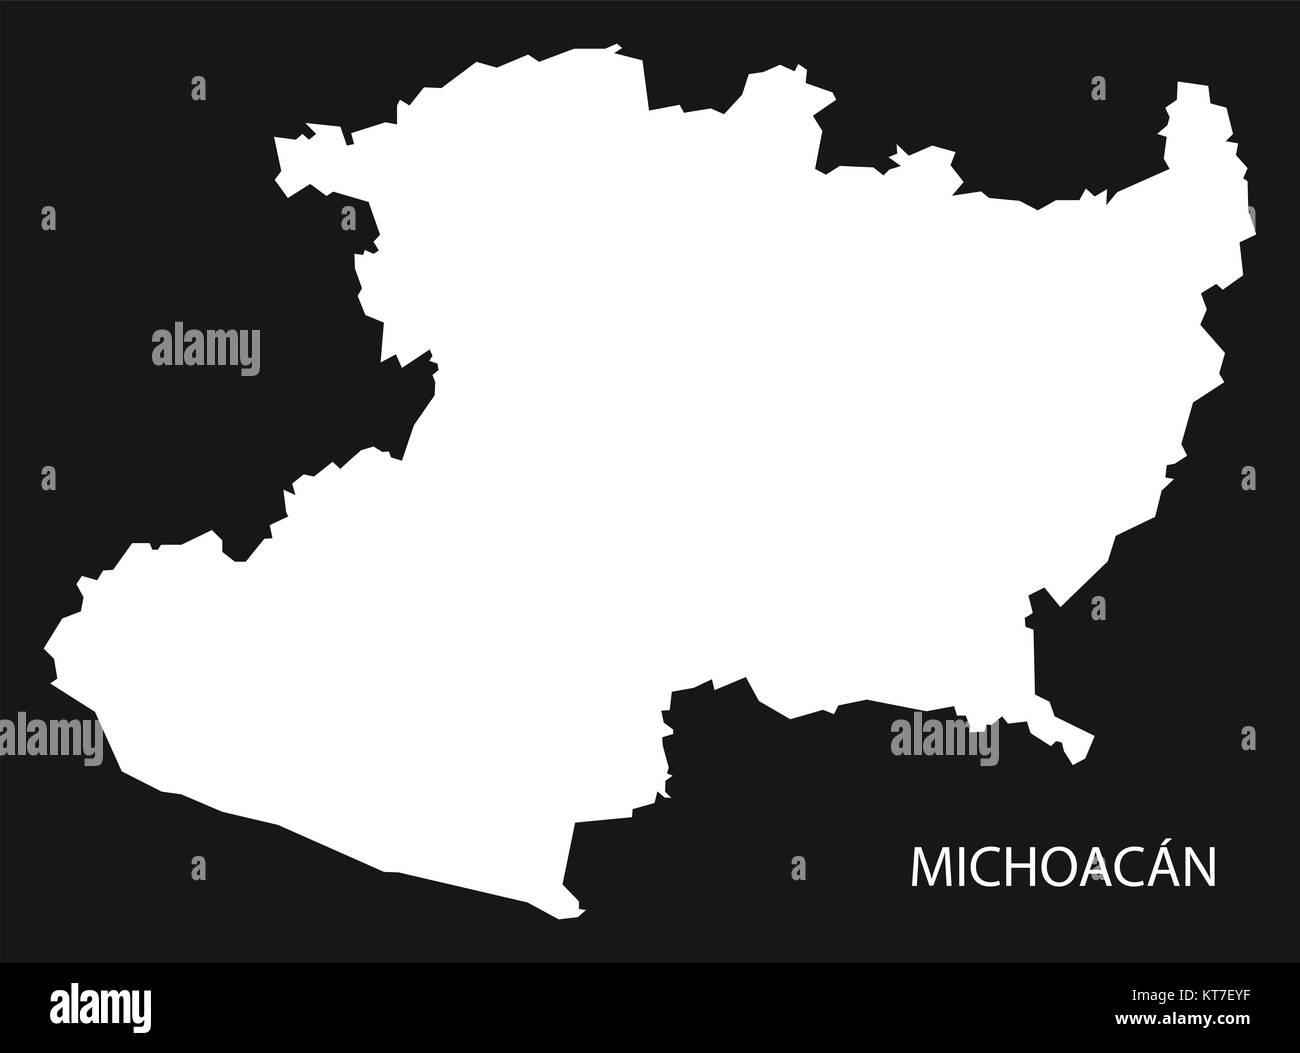 Michoacan Mexico Map black inverted silhouette Stock Photo ...